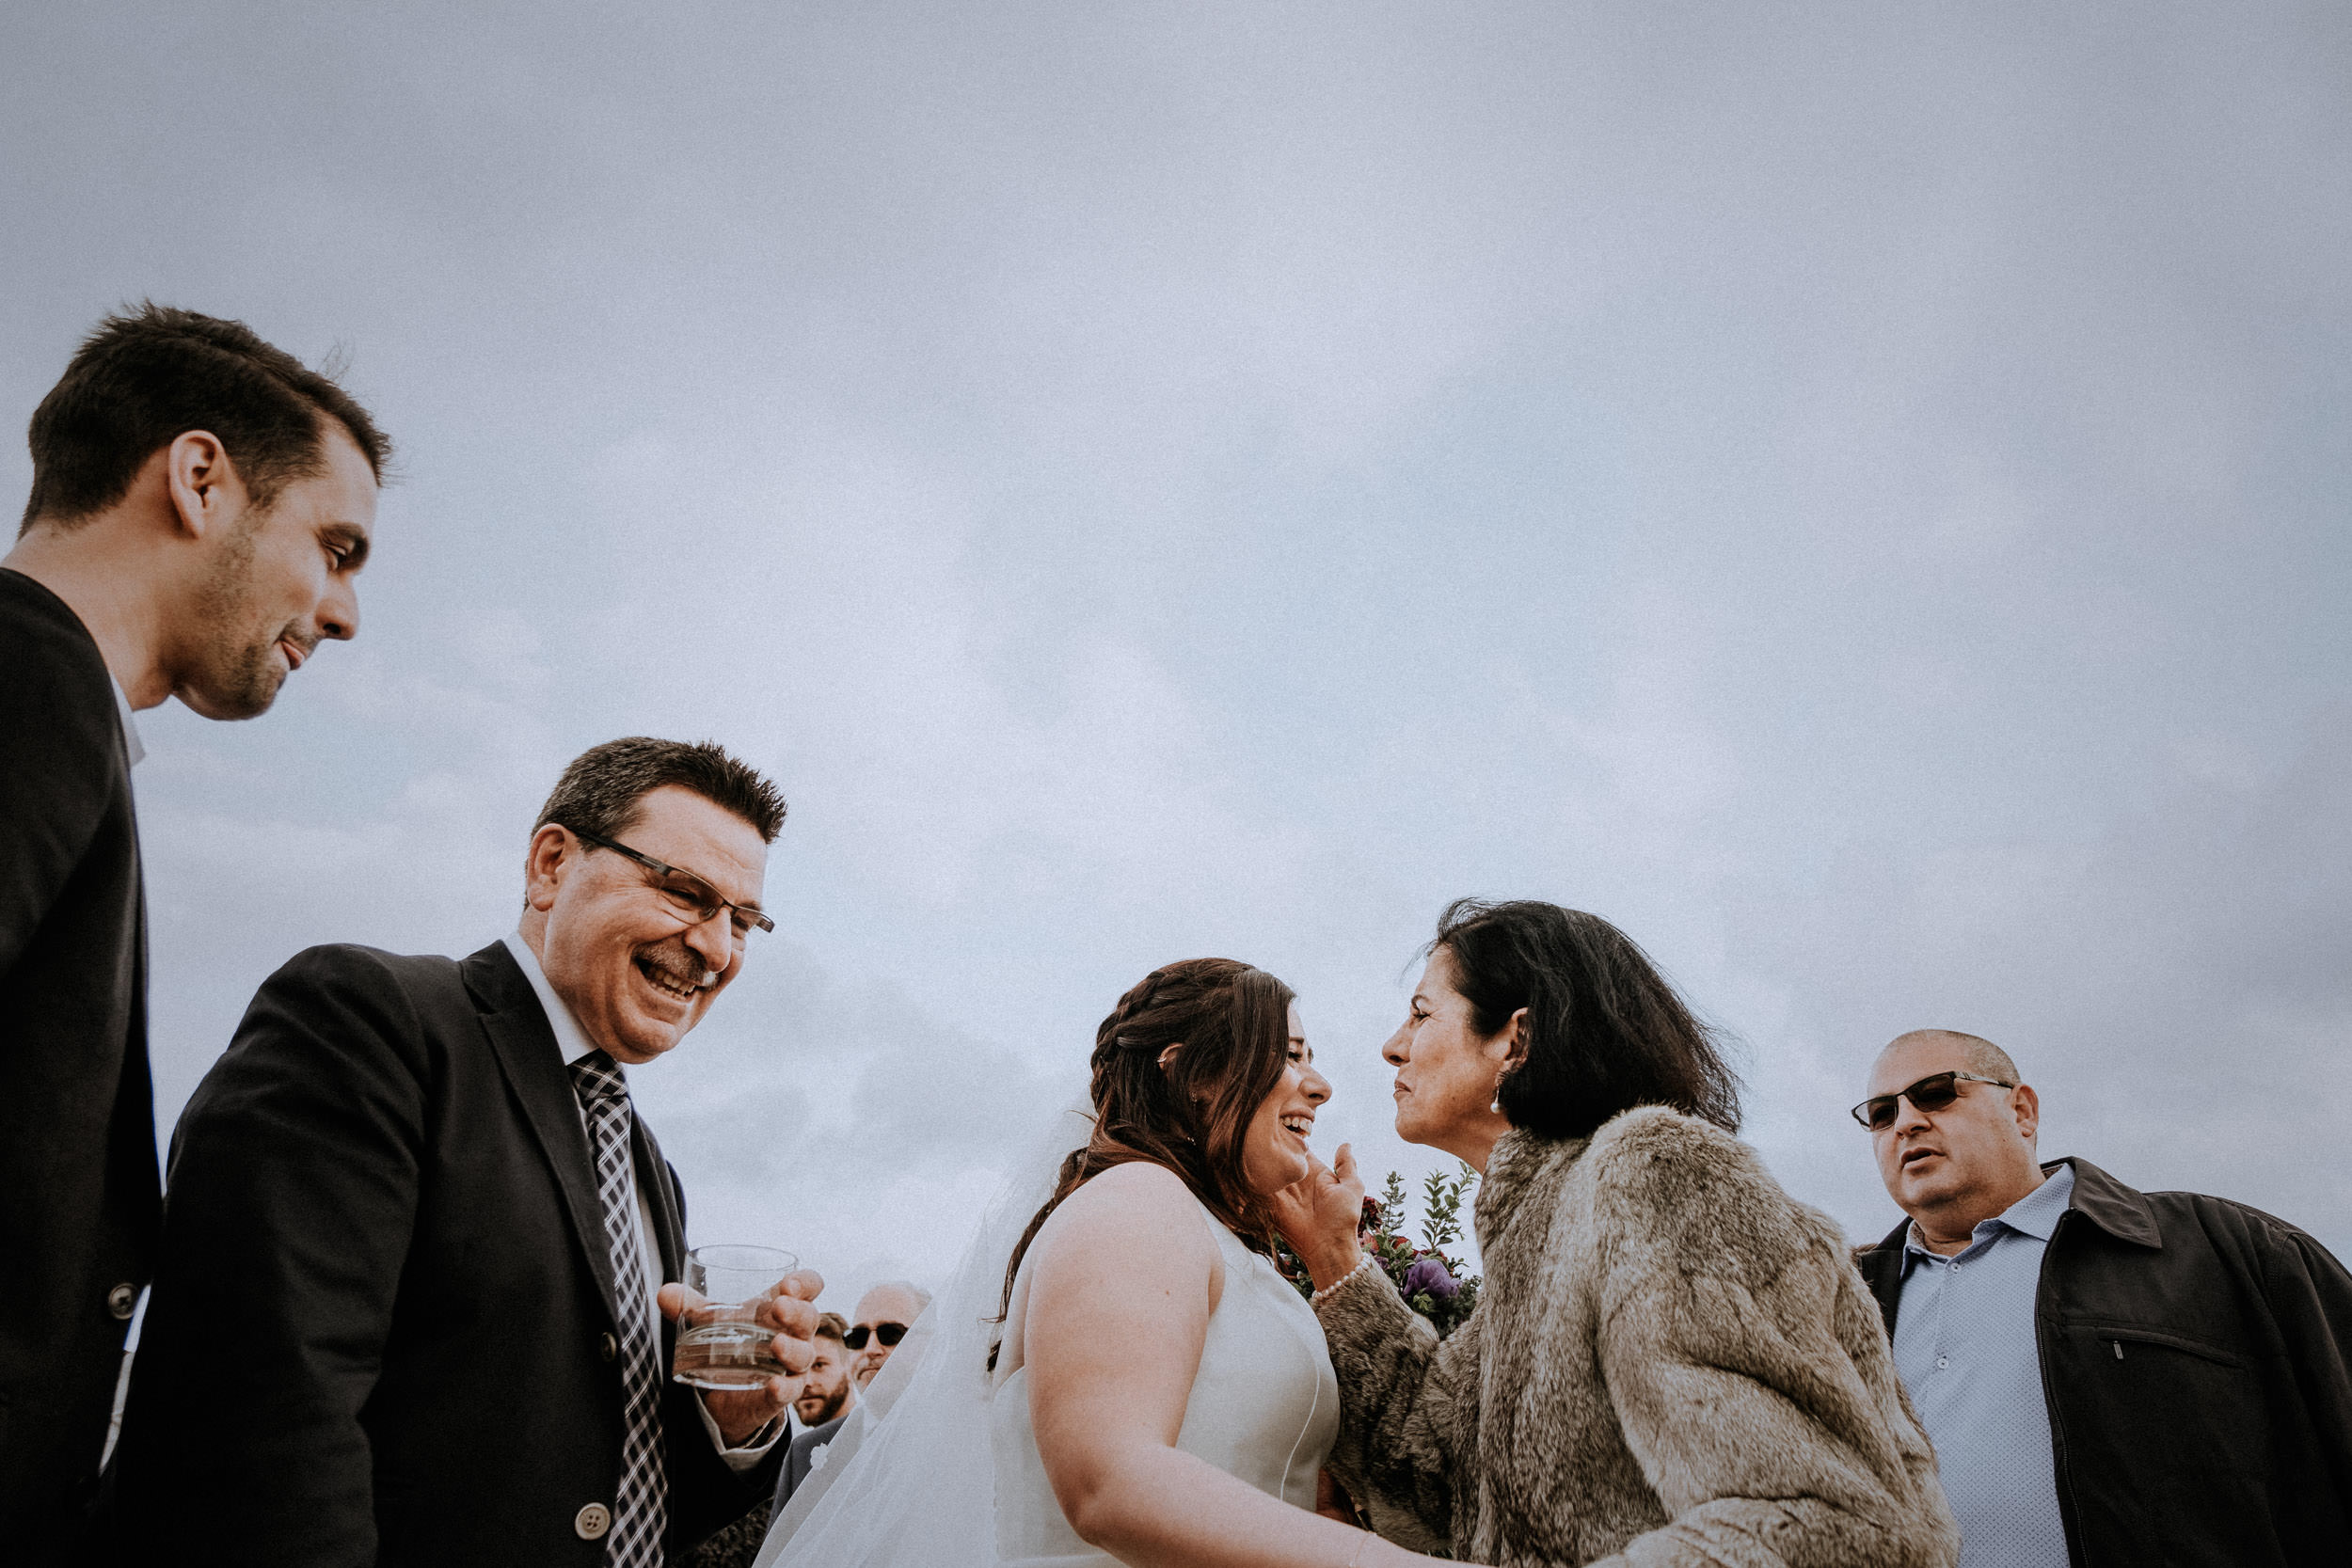 s+j_top_elopement wedding photography_kings & thieves_blog - 354.jpg